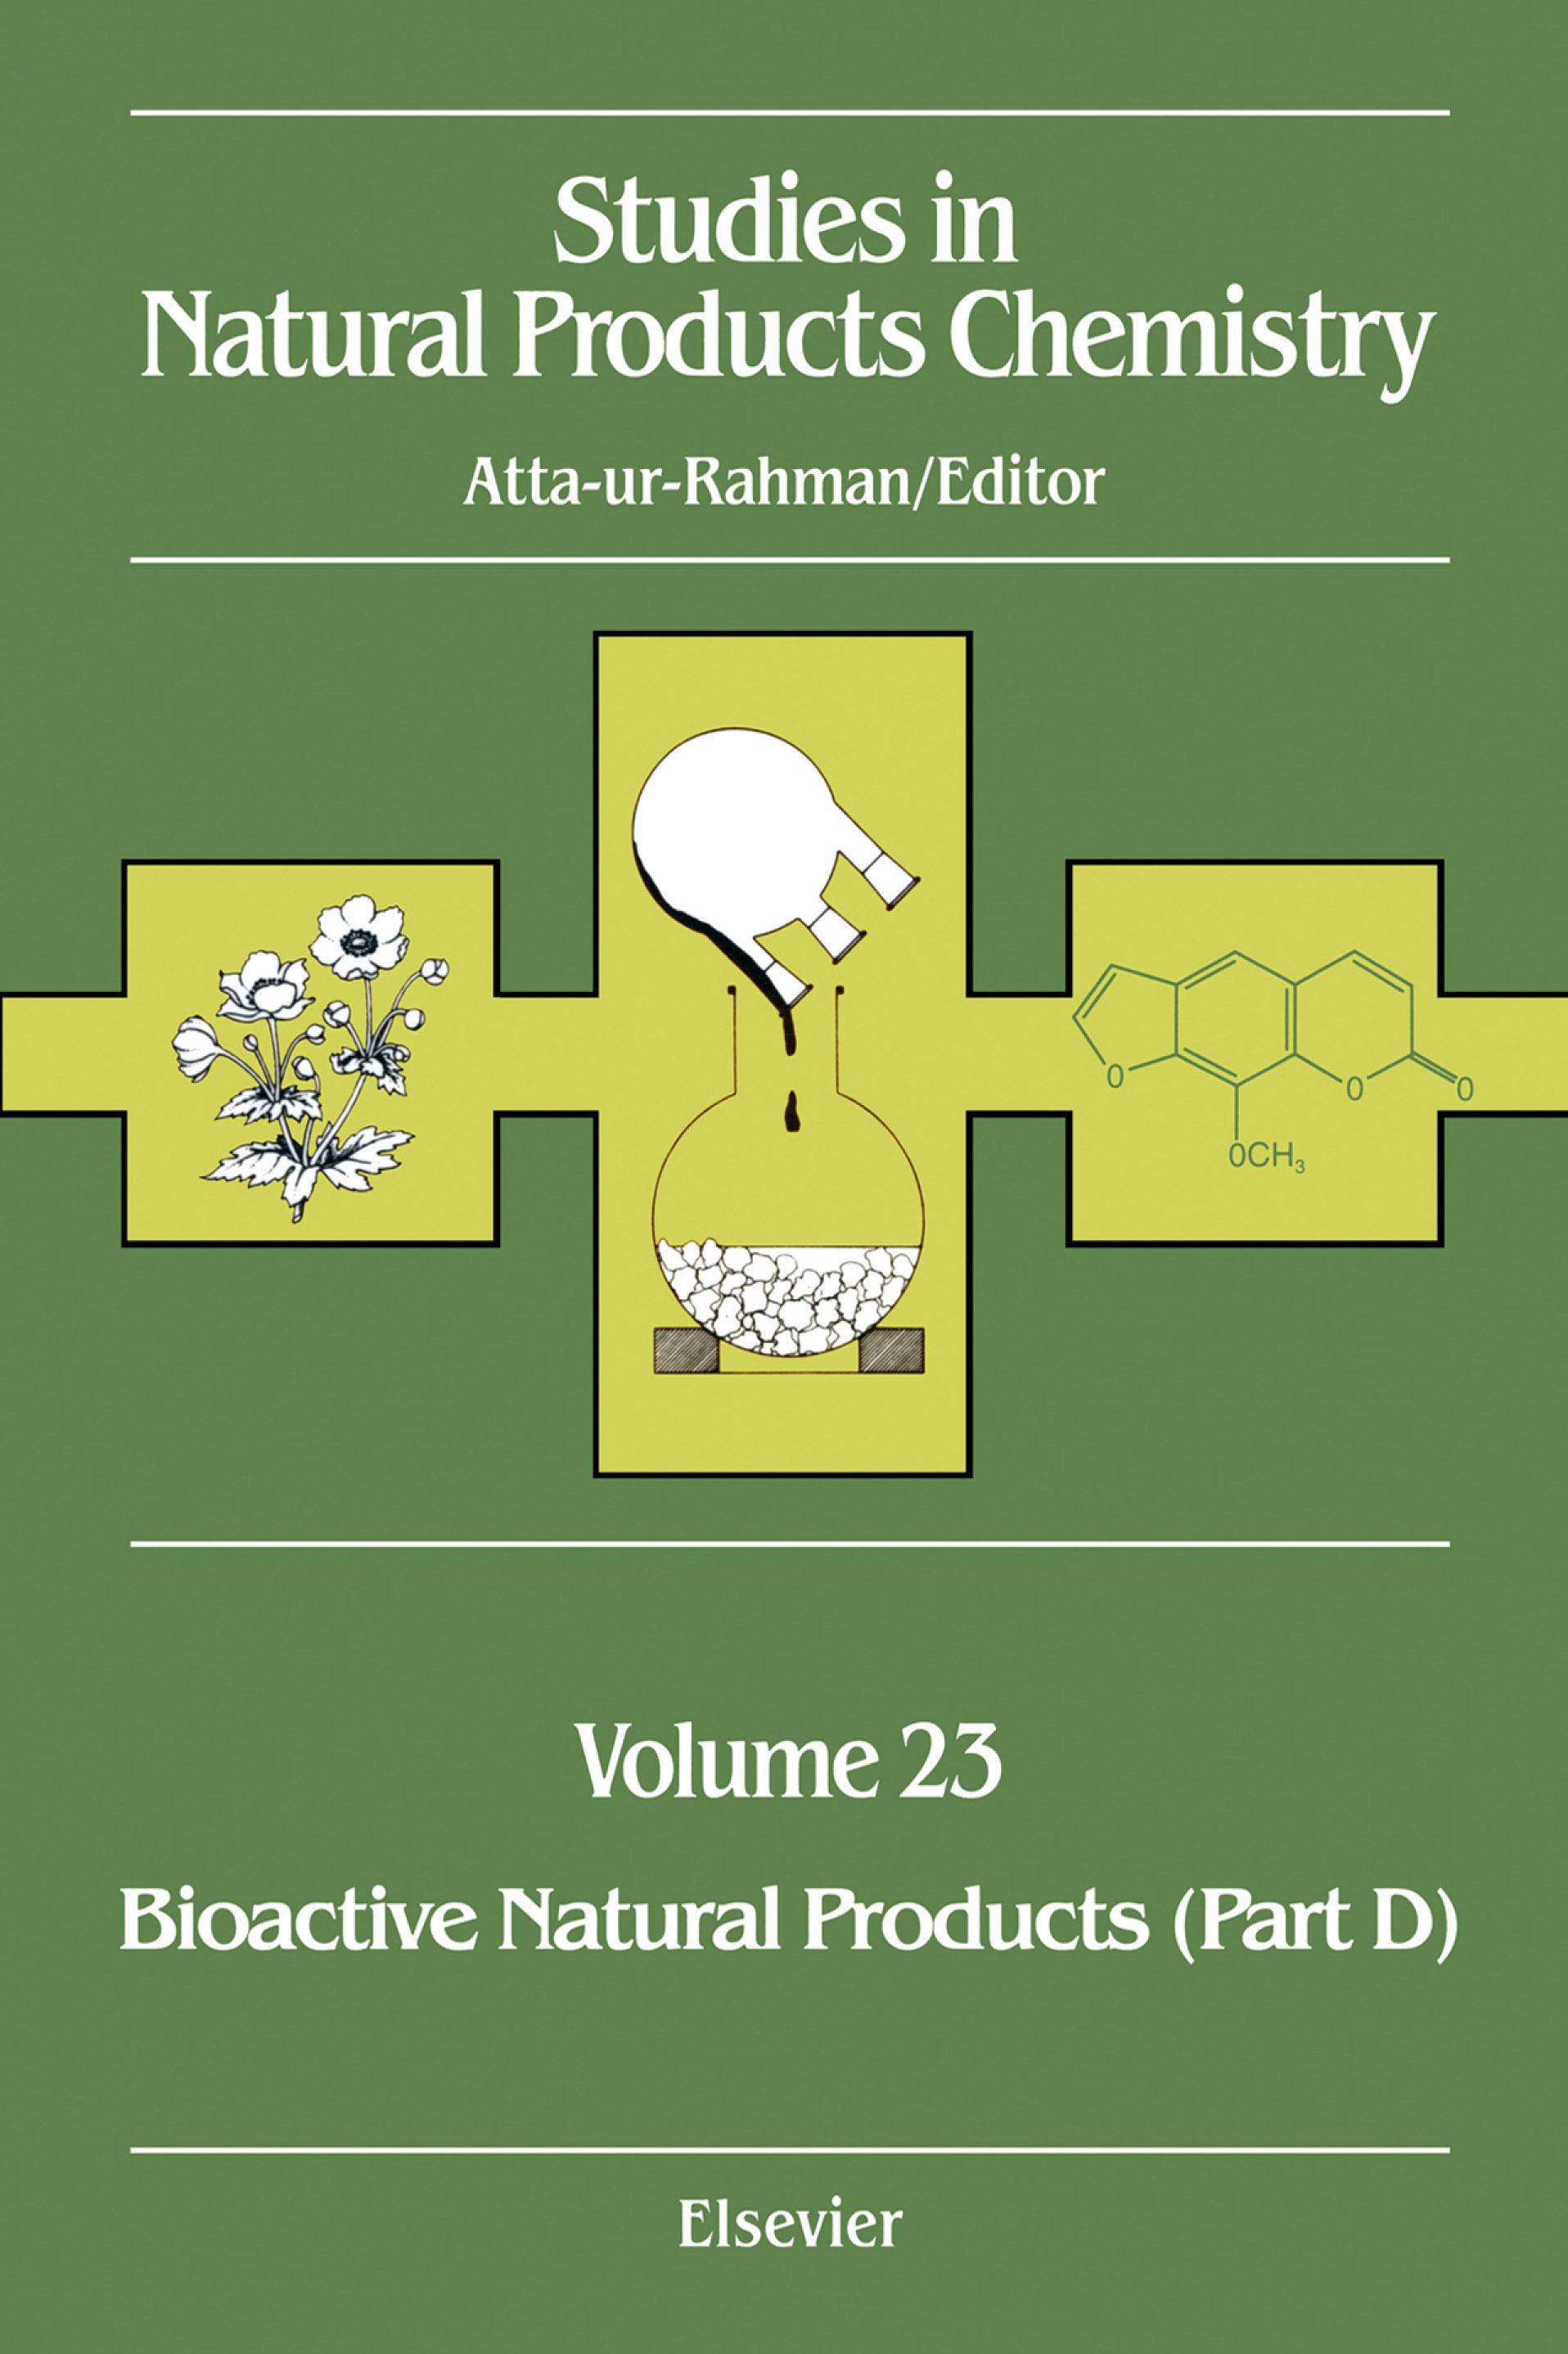 Bioactive Natural Products (Part D): V23